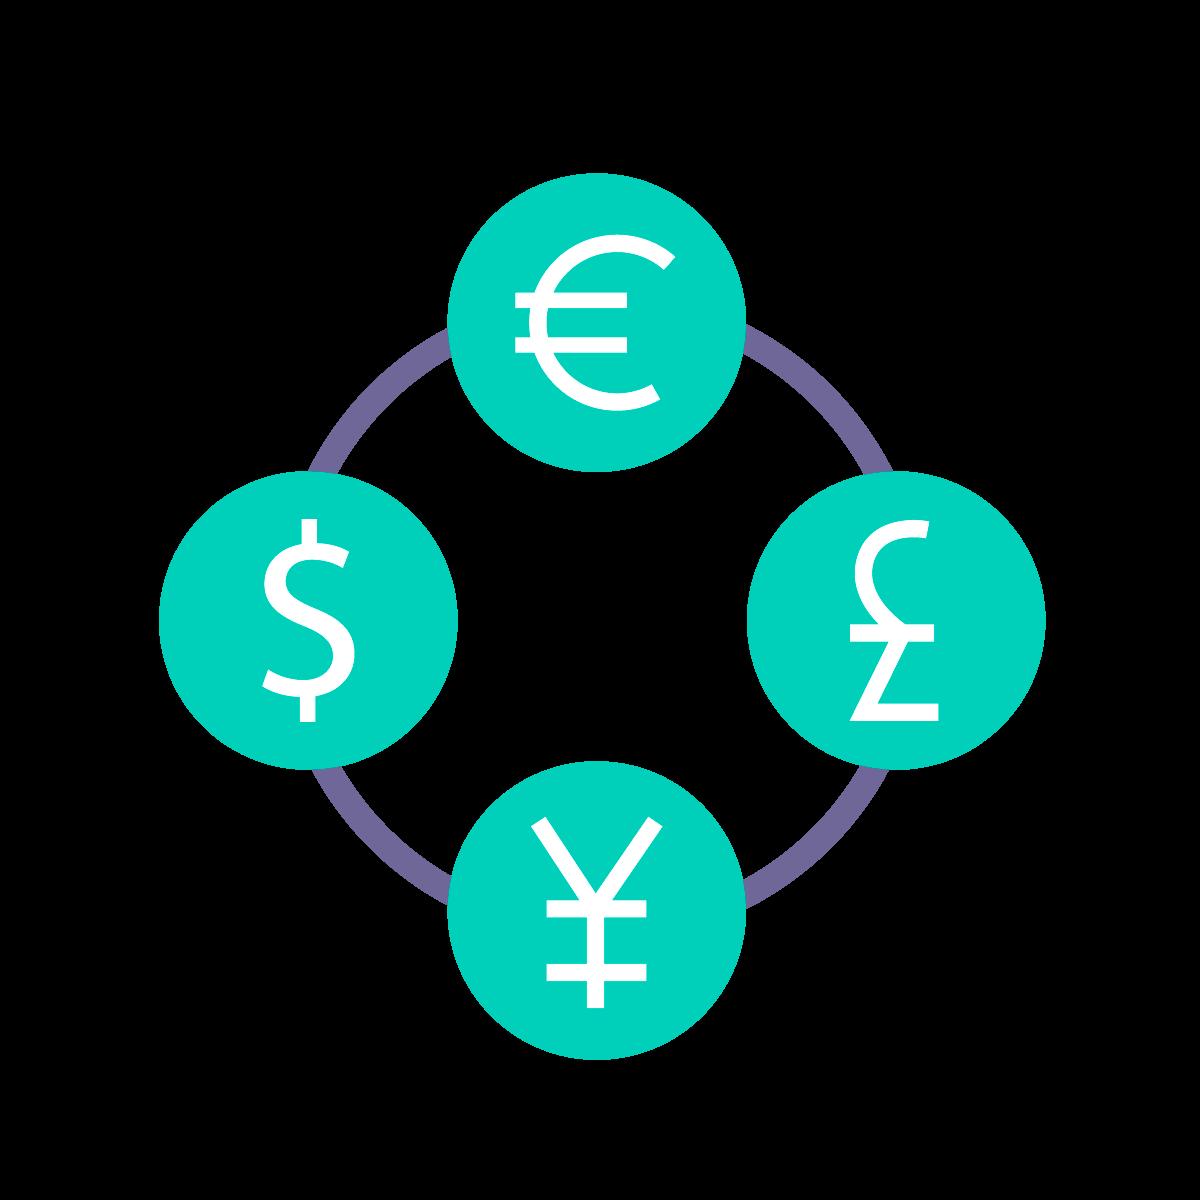 USD, MYR, HKD, INR currencies